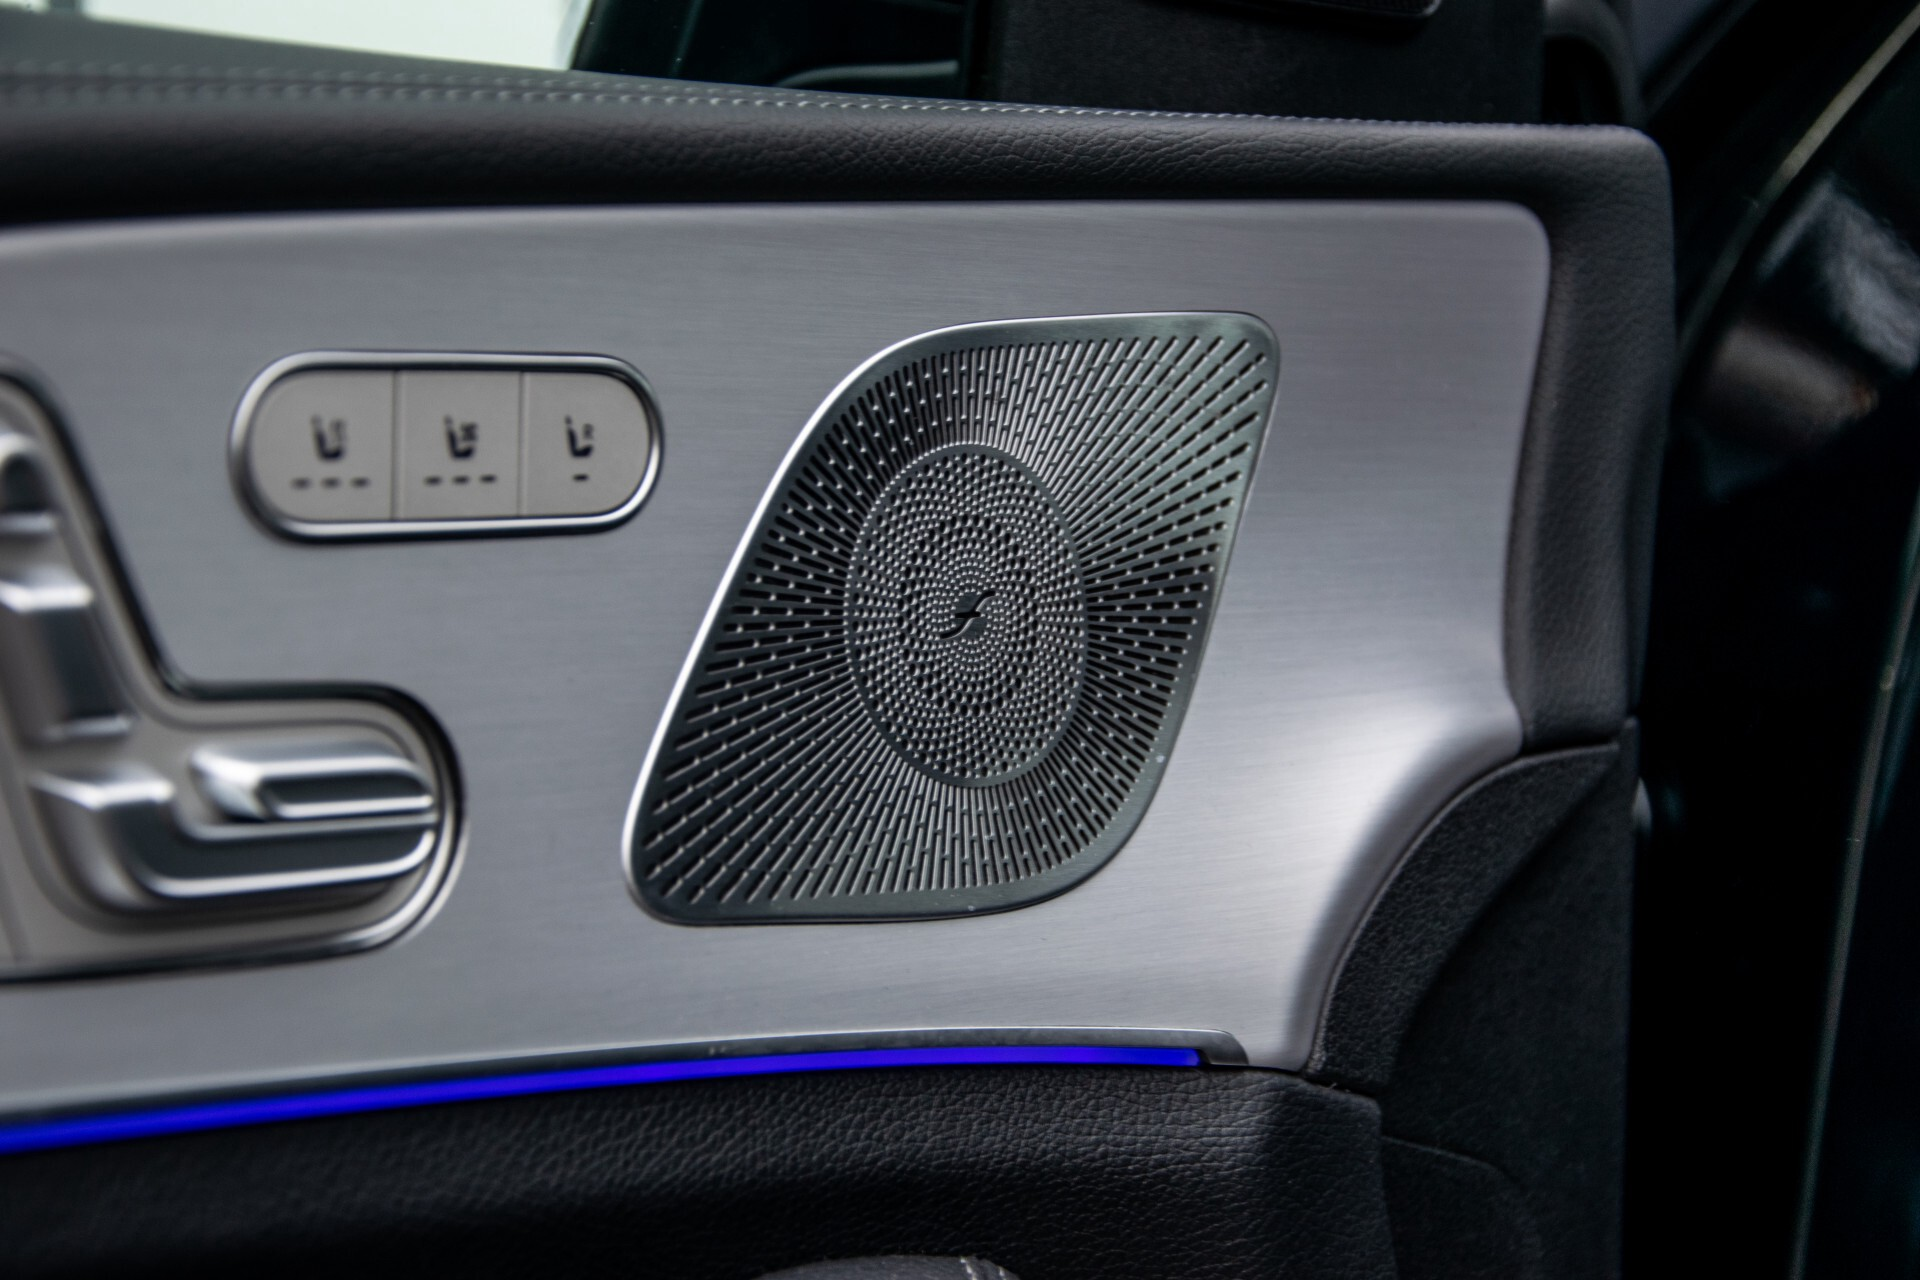 Mercedes-Benz GLE 450 4-M 7-Persoons AMG Massage/Rij-assist/Keyless/TV/360/Night/Trekhaak Aut9 Foto 31